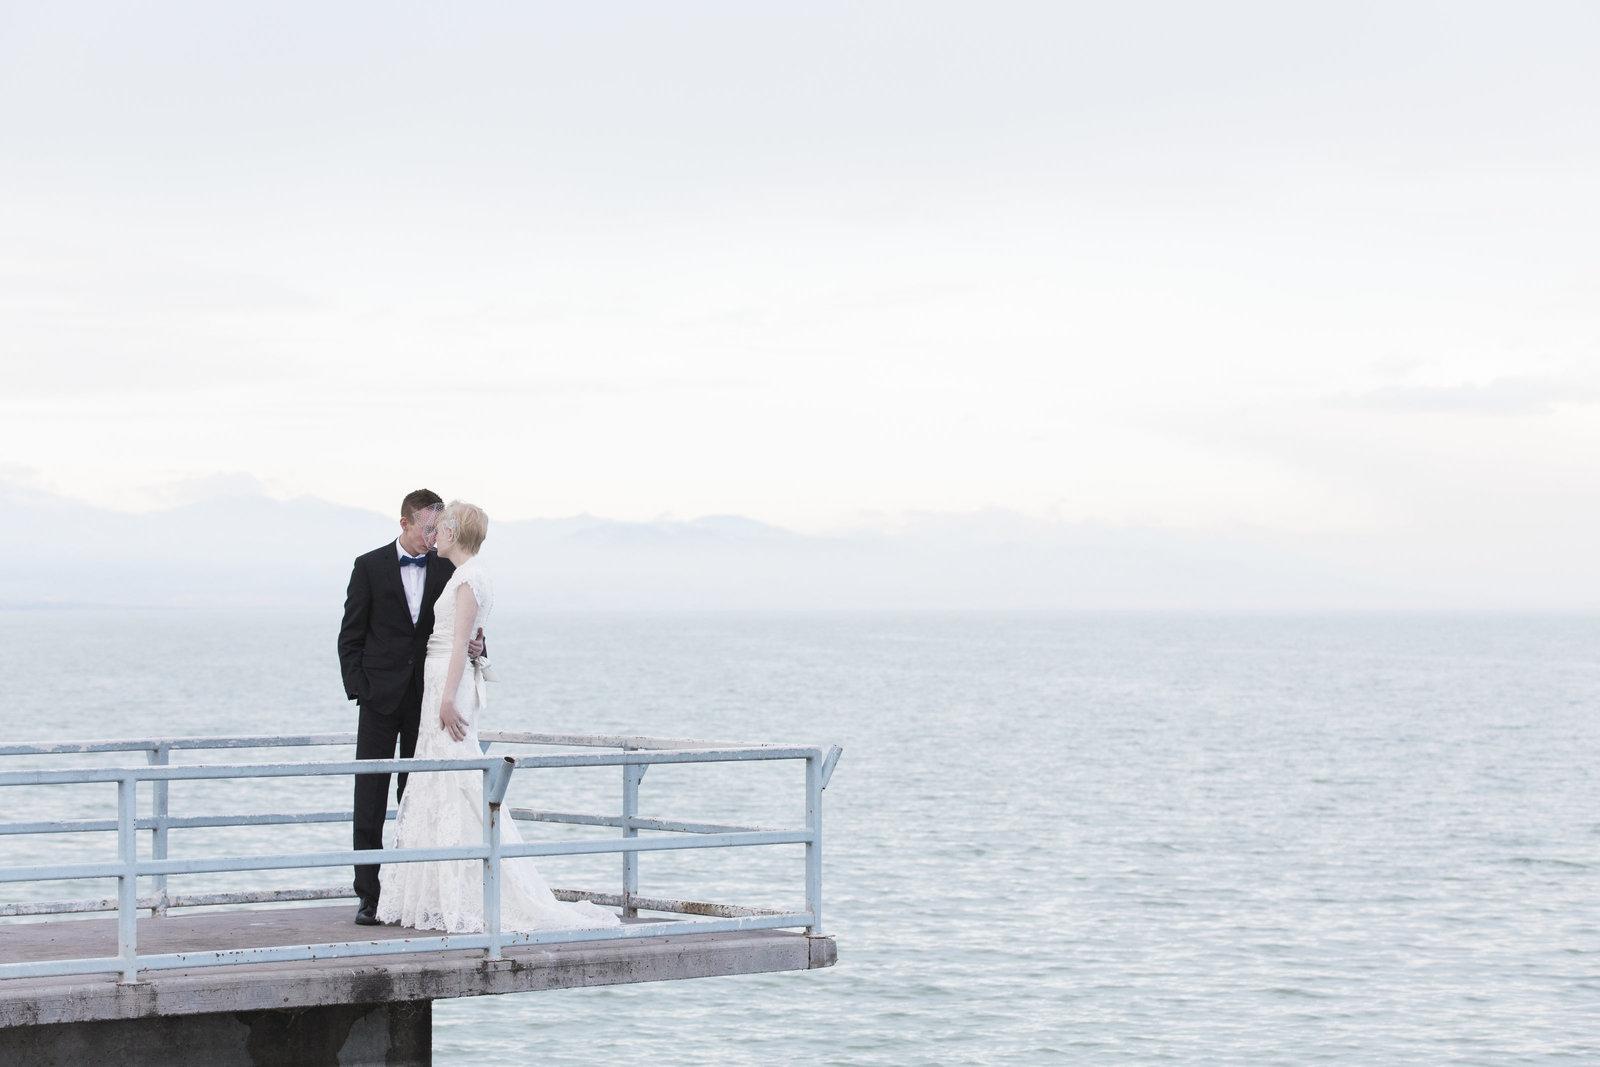 destination wedding photographer chicago illinois wedding photographer-7479